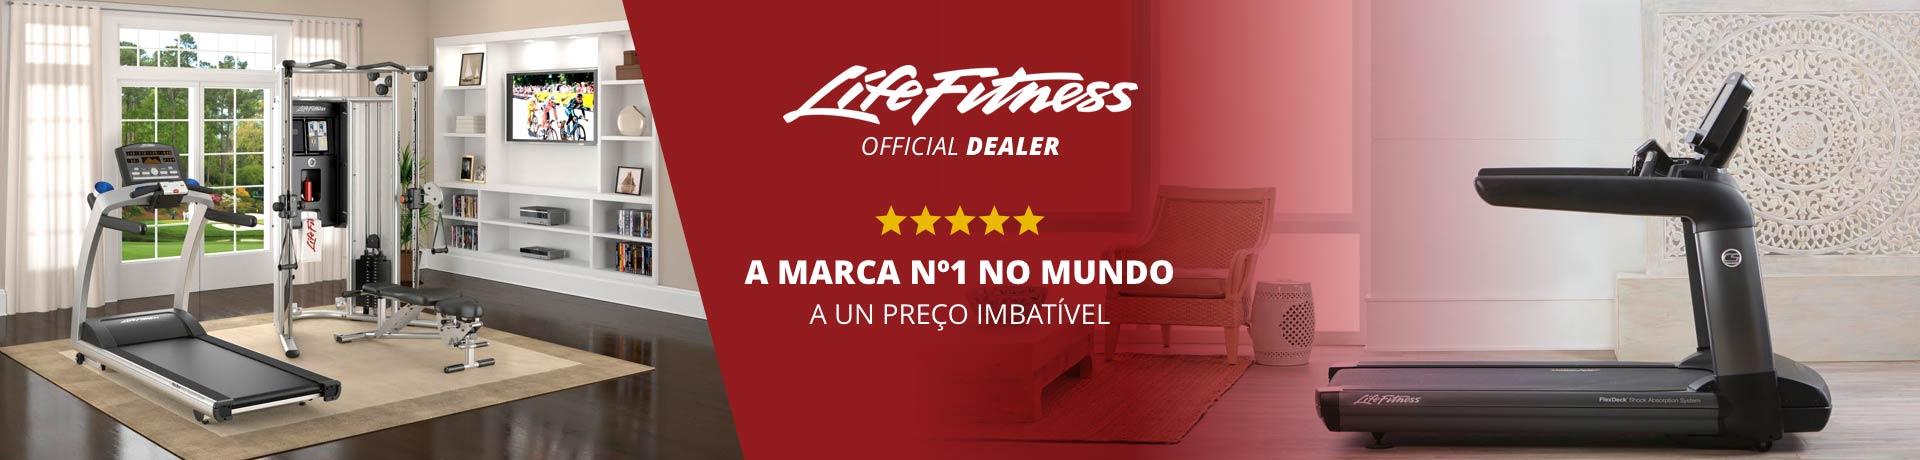 saldos-life-fitness